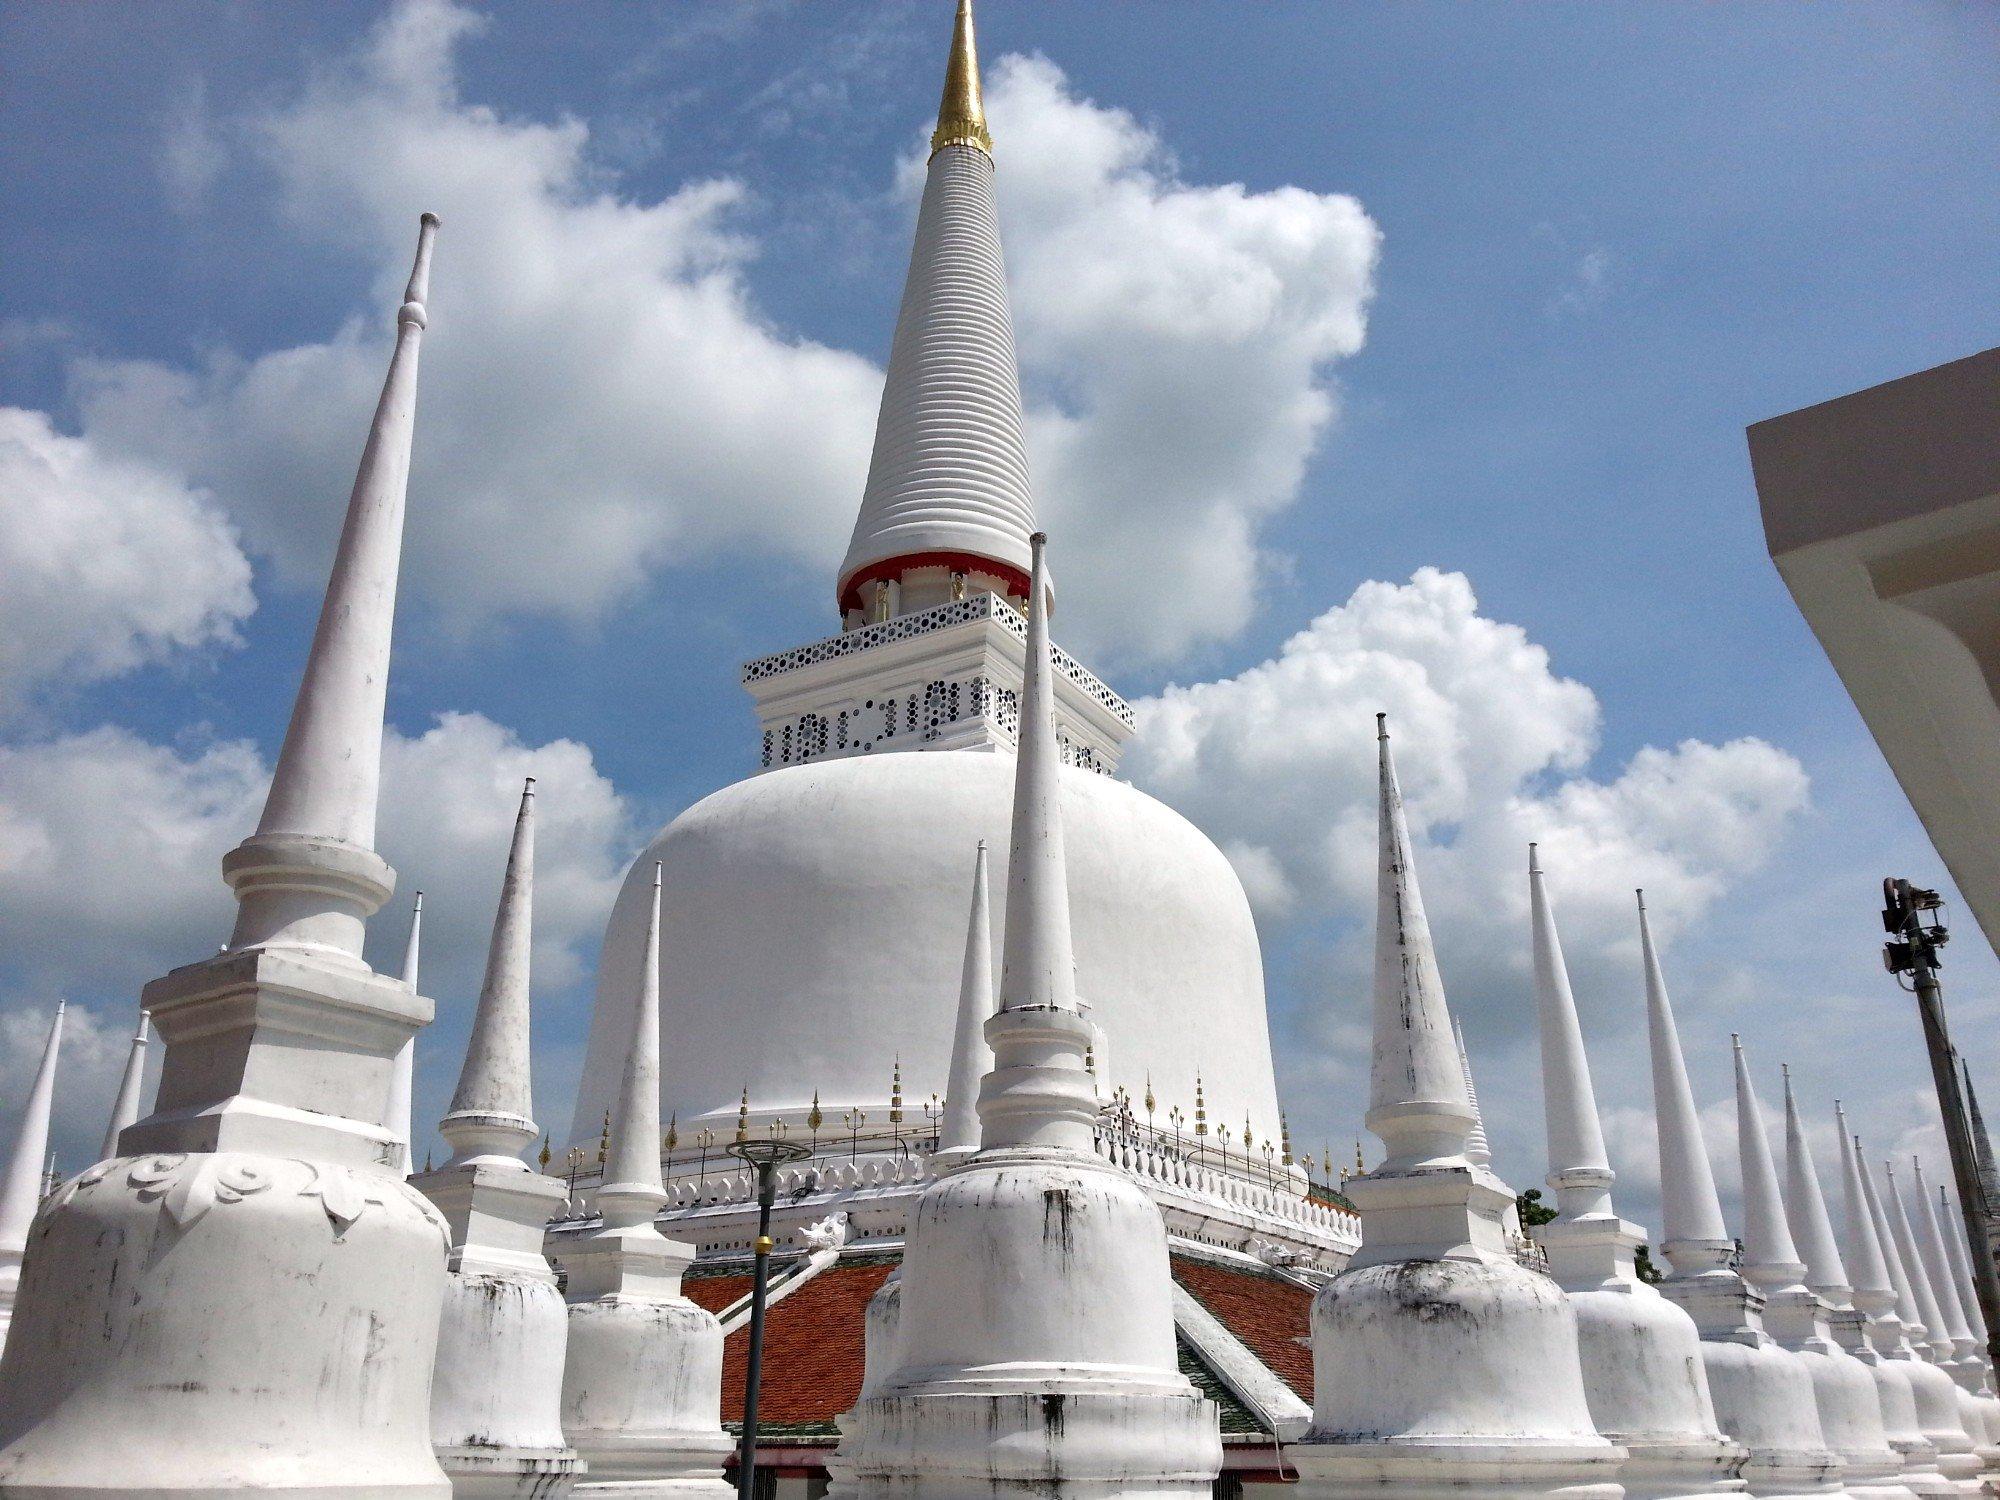 Wat Phra Mahathat Woramahawihan in Nakhon Si Thammarat